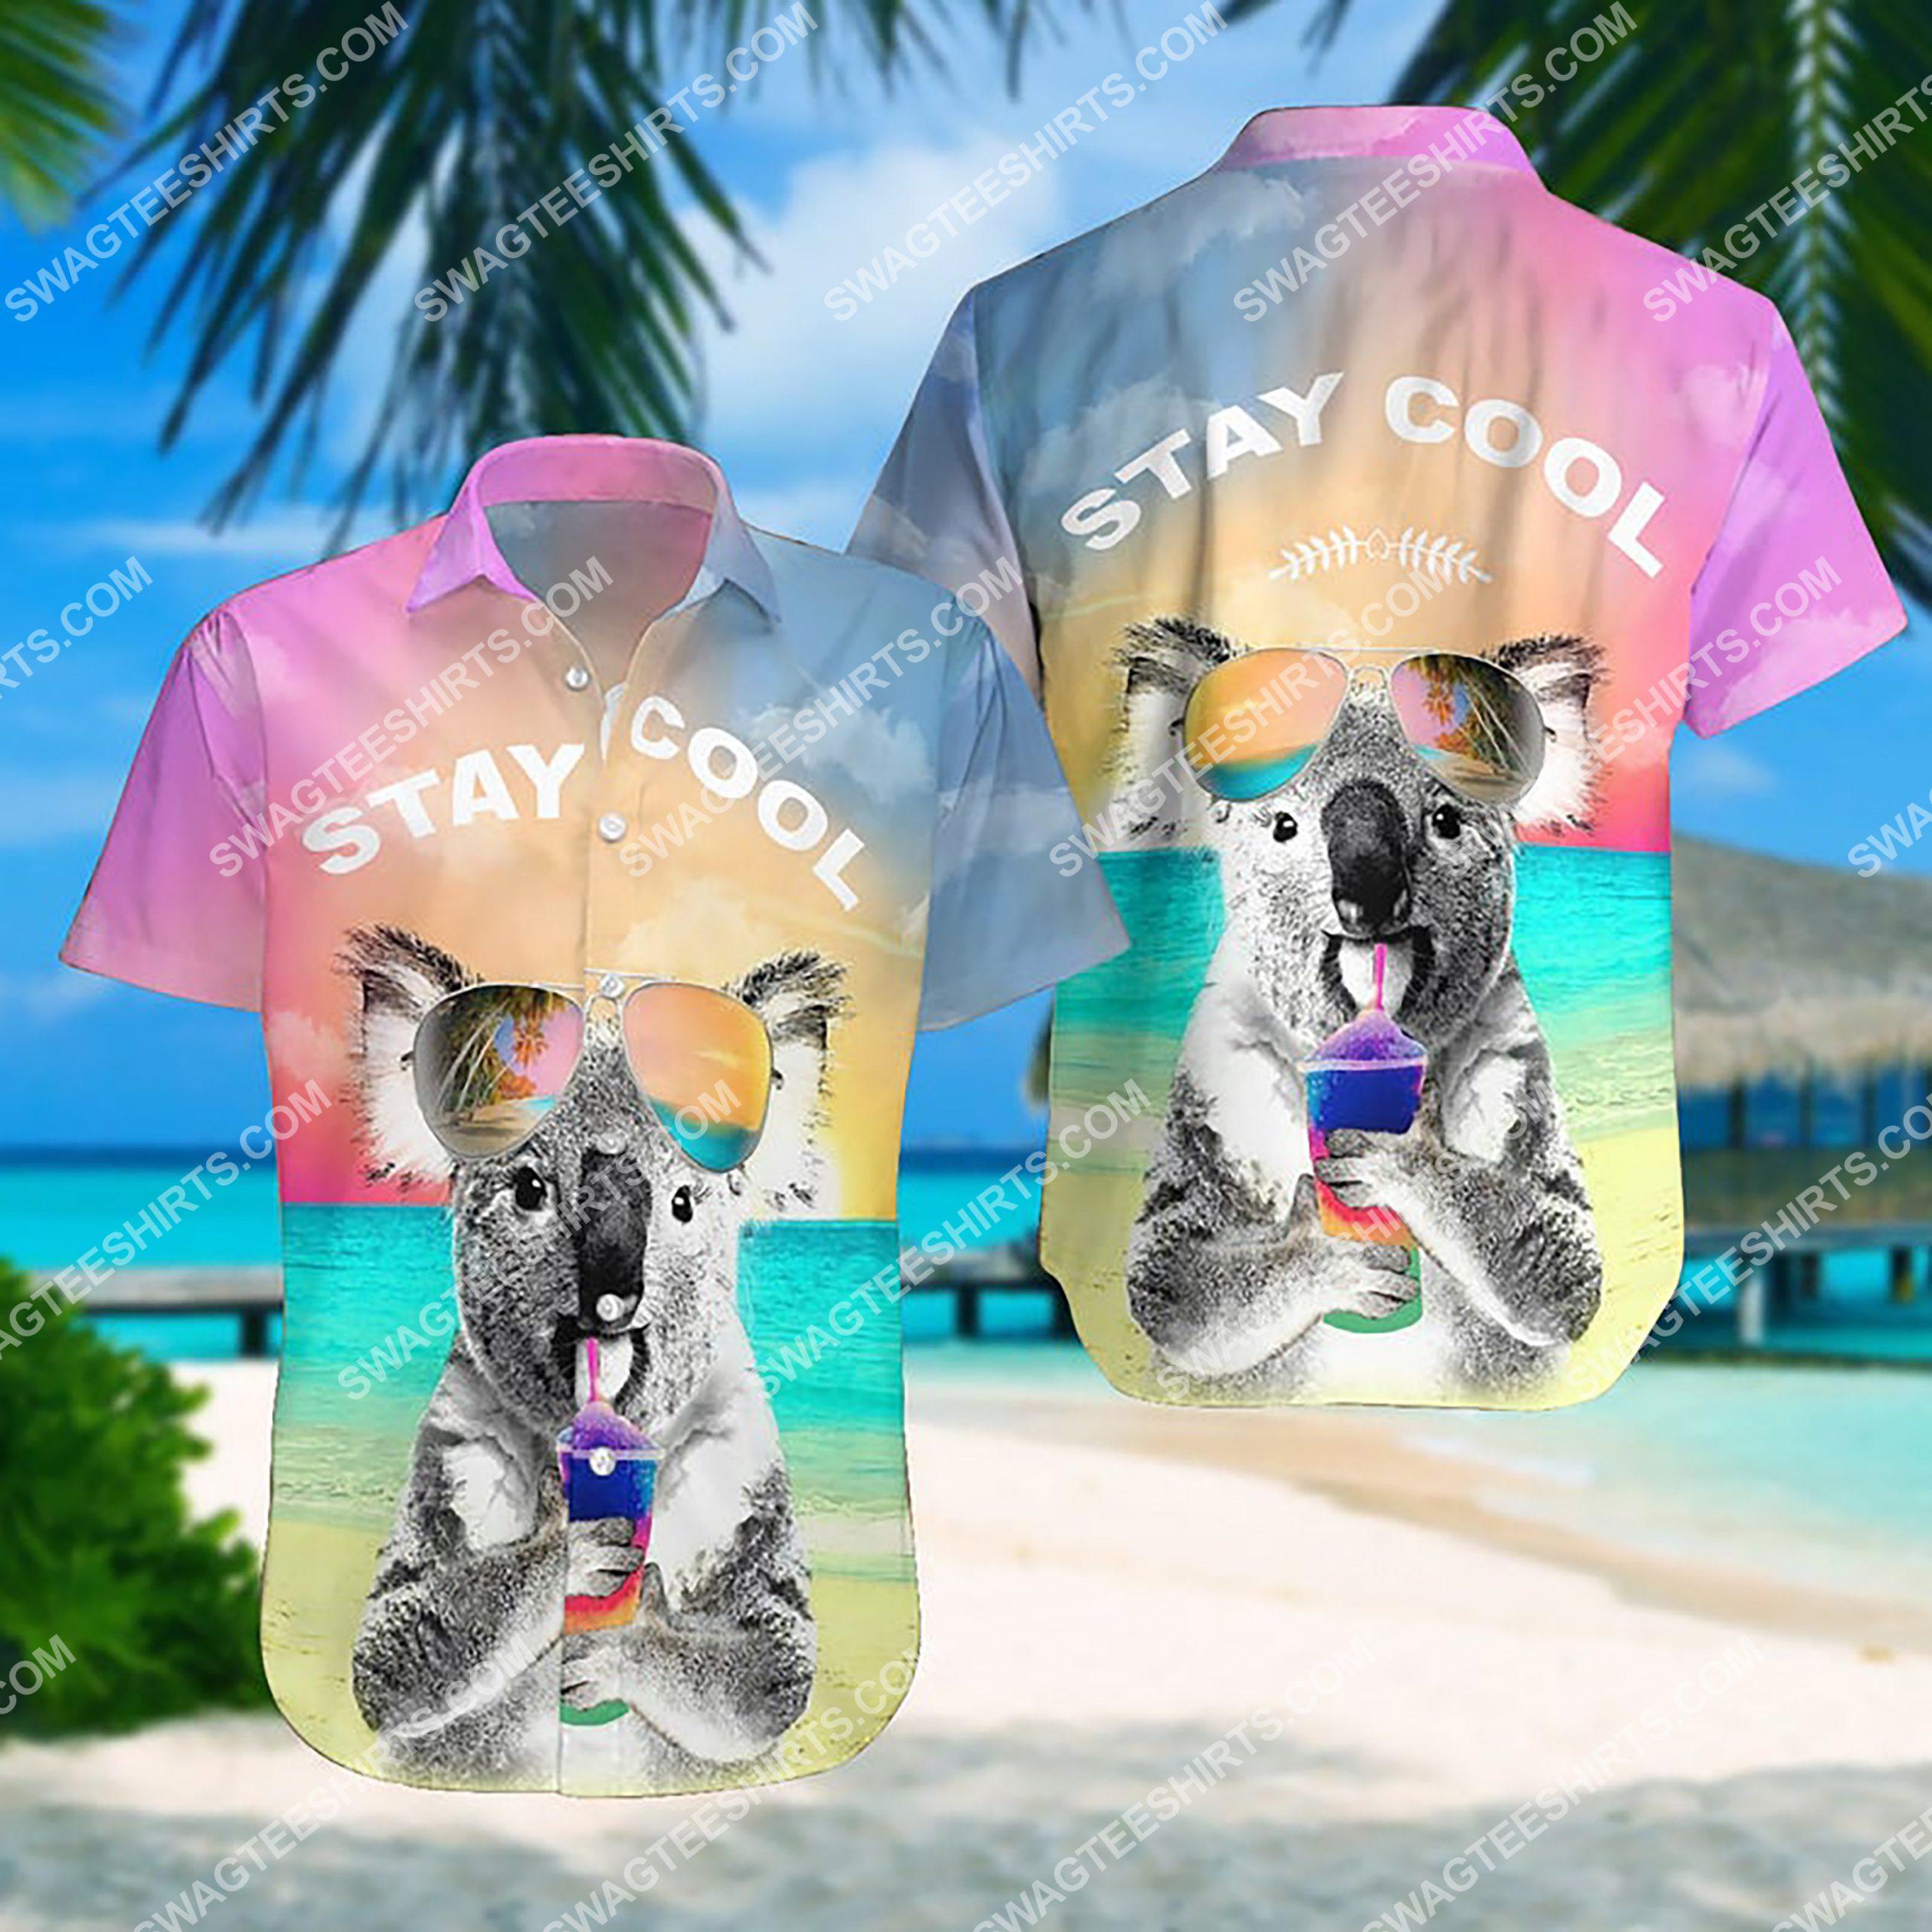 summer time koala stay cool all over print hawaiian shirt 3 - Copy